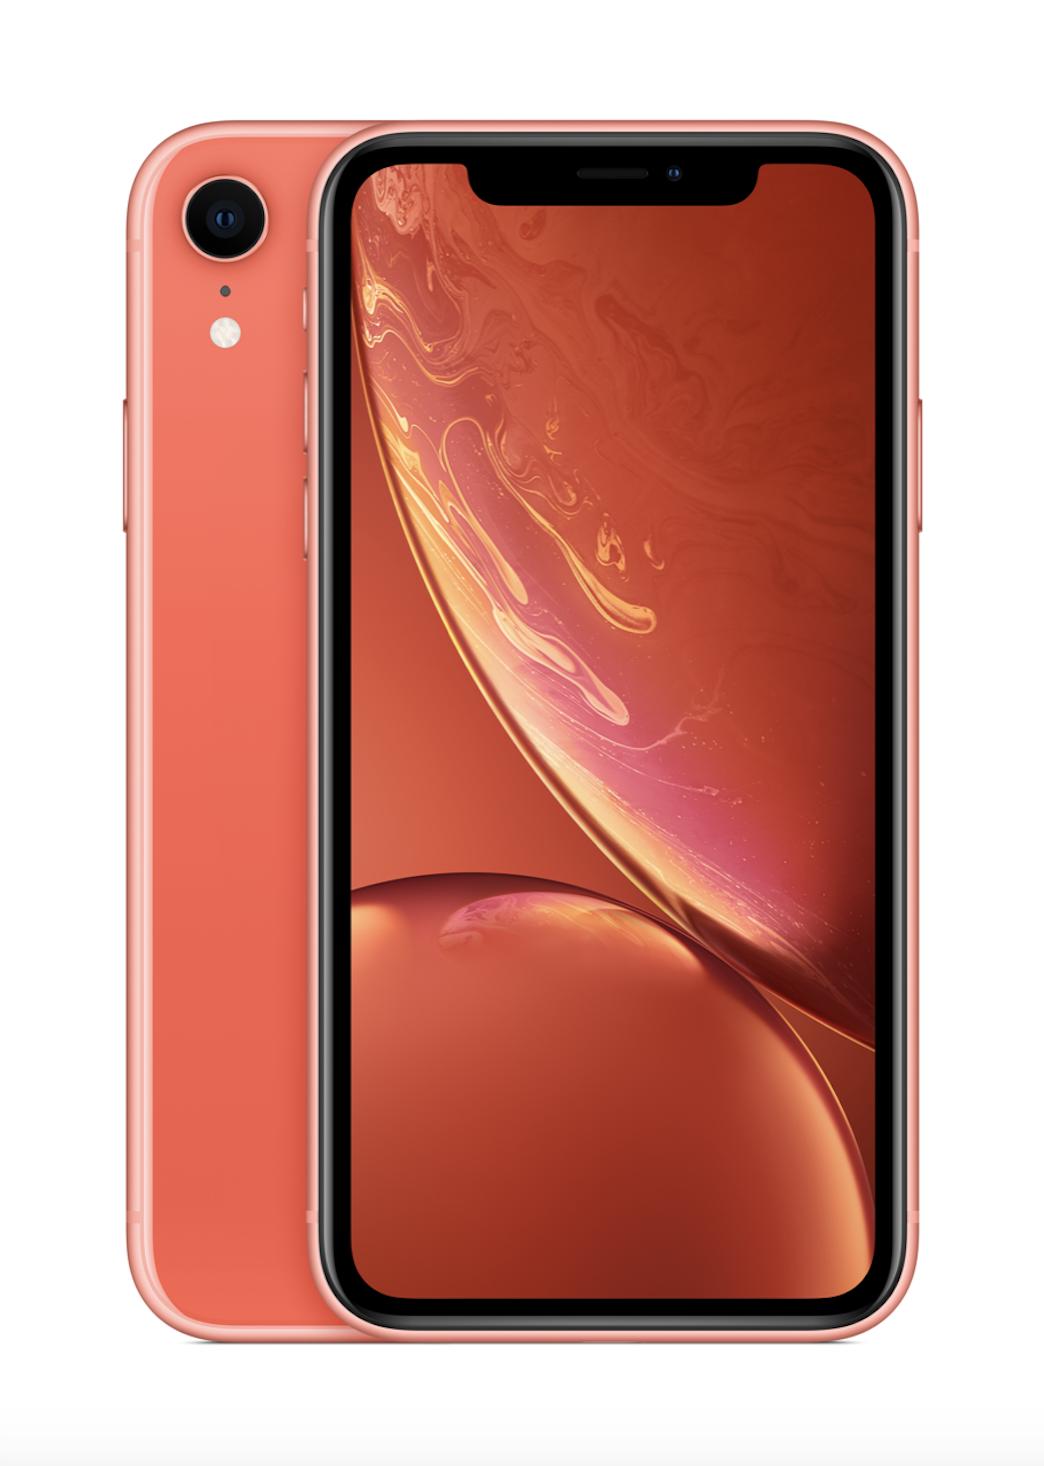 Apple iPhone Xr 64GB - Coral -Refurbished